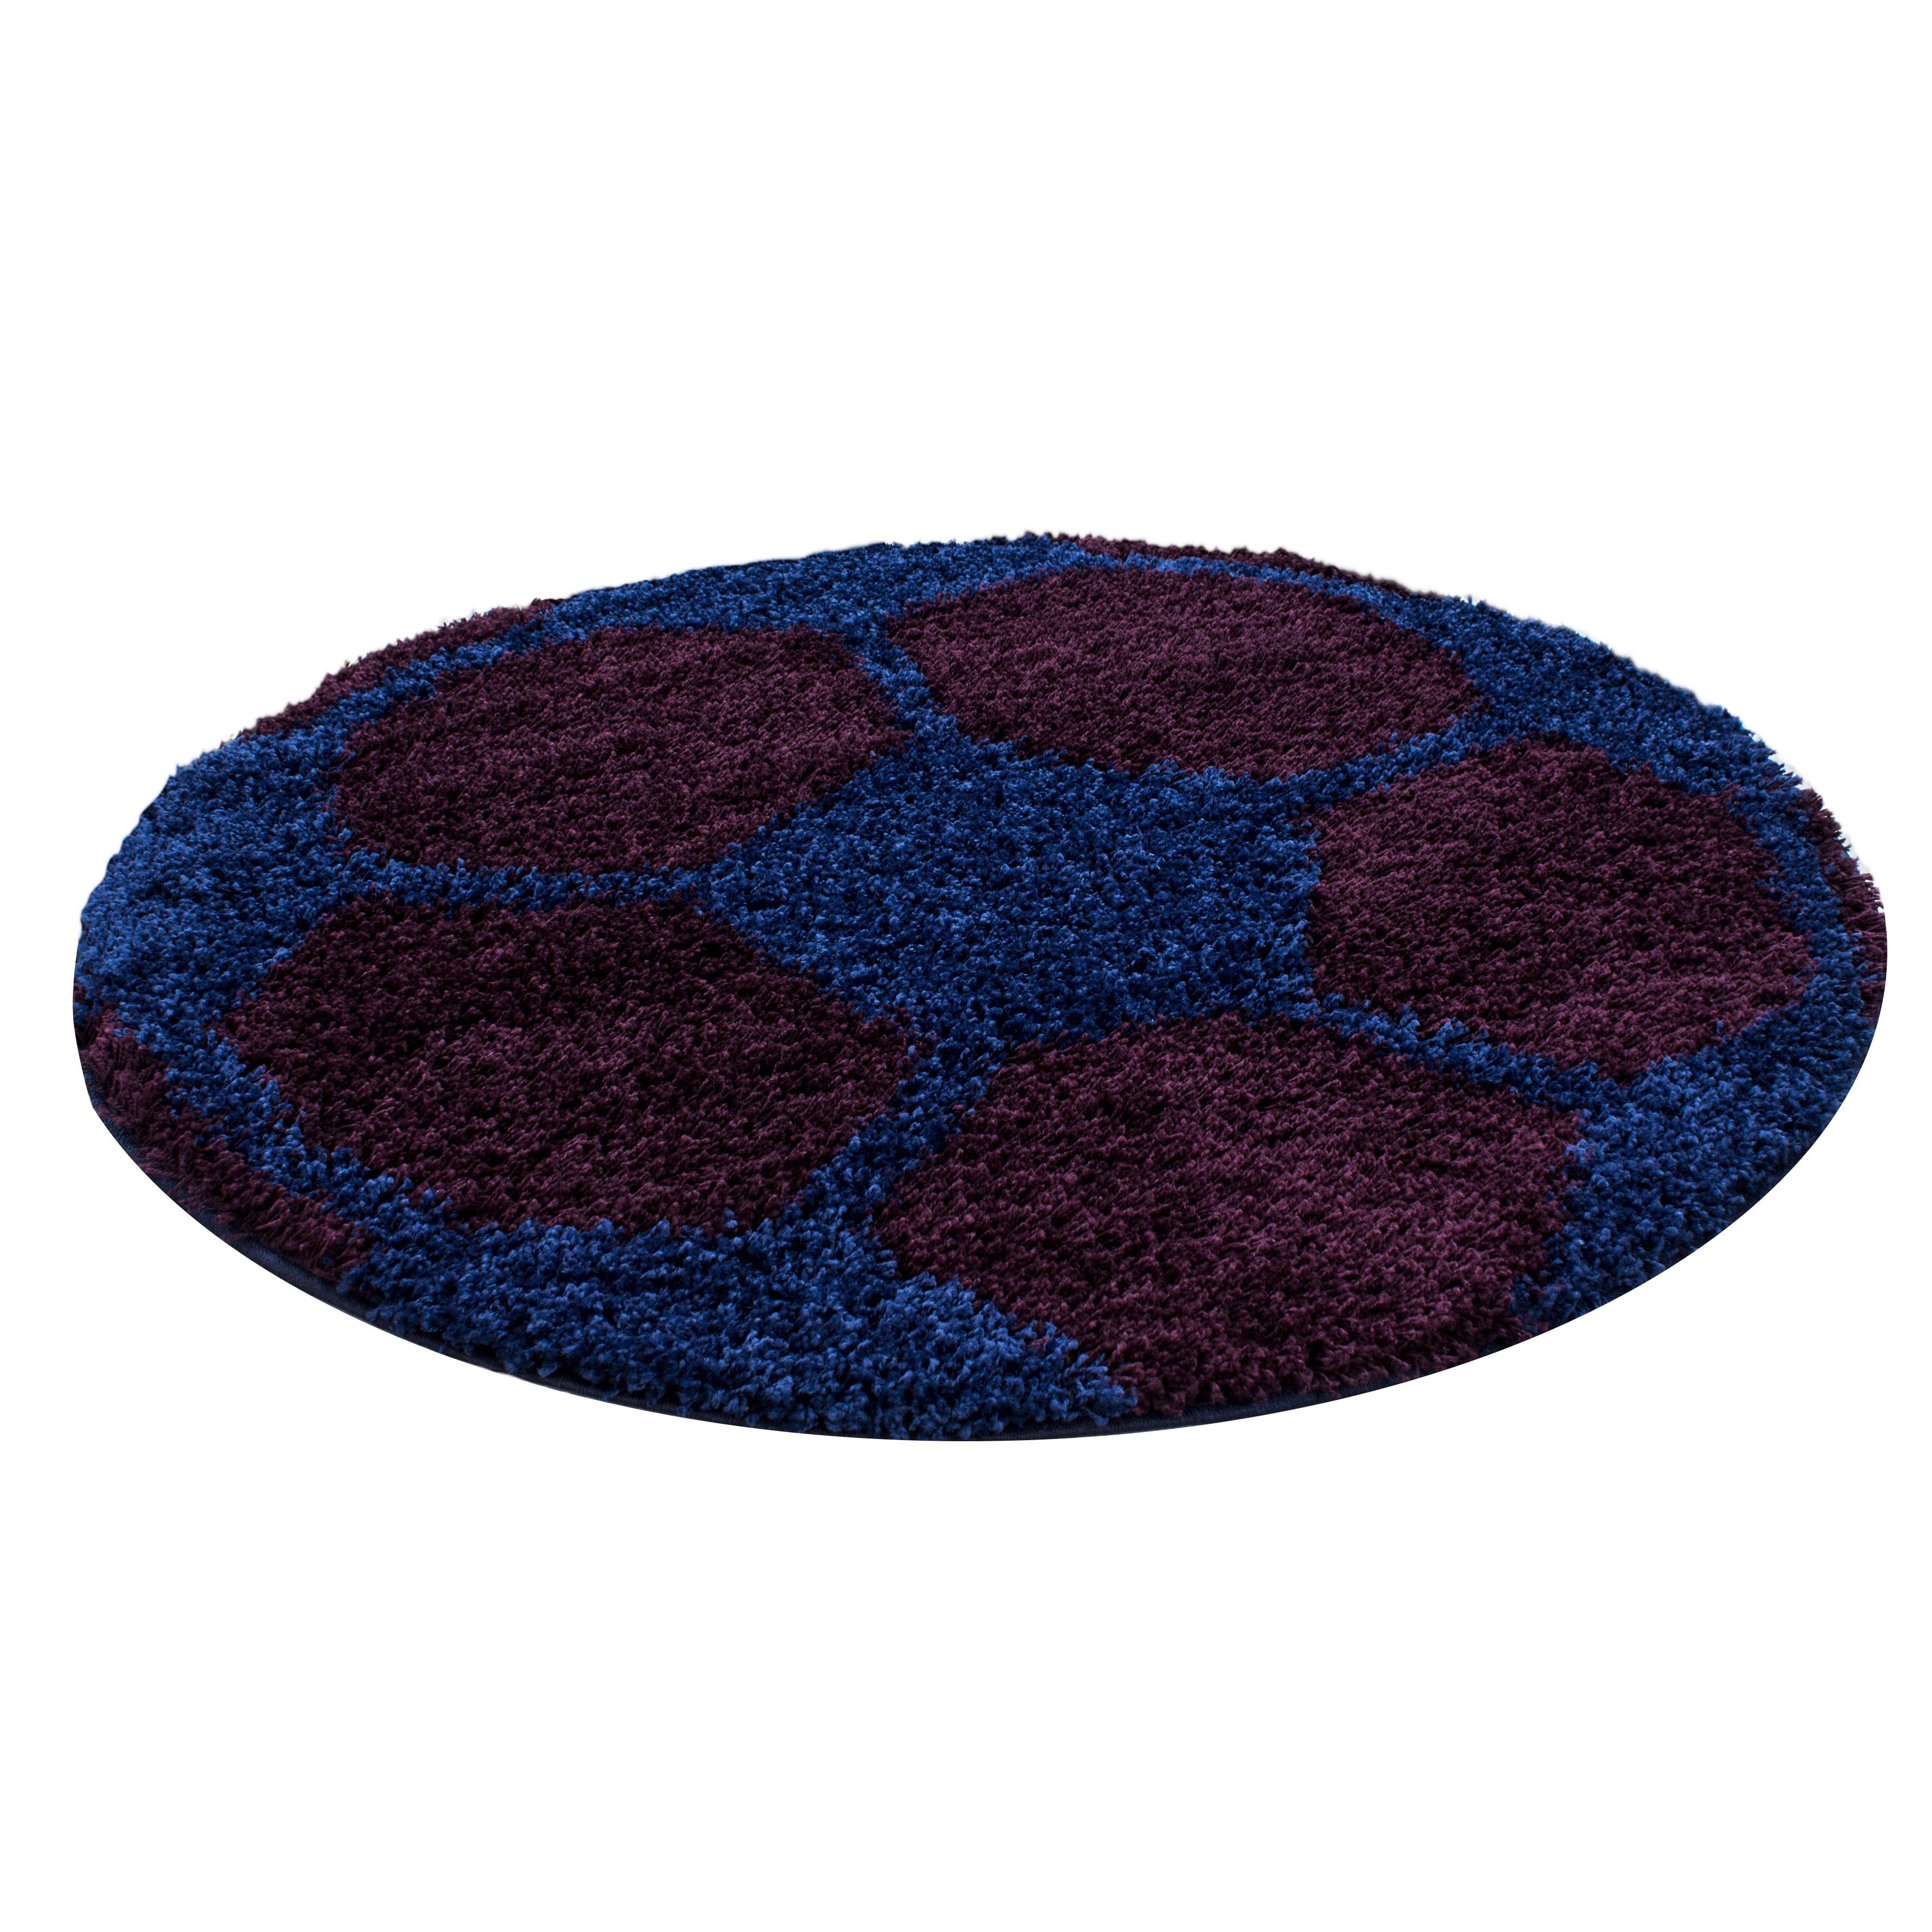 Ayyildiz koberce Kusový koberec Fun 6001 navy - 100x100 (průměr) kruh cm